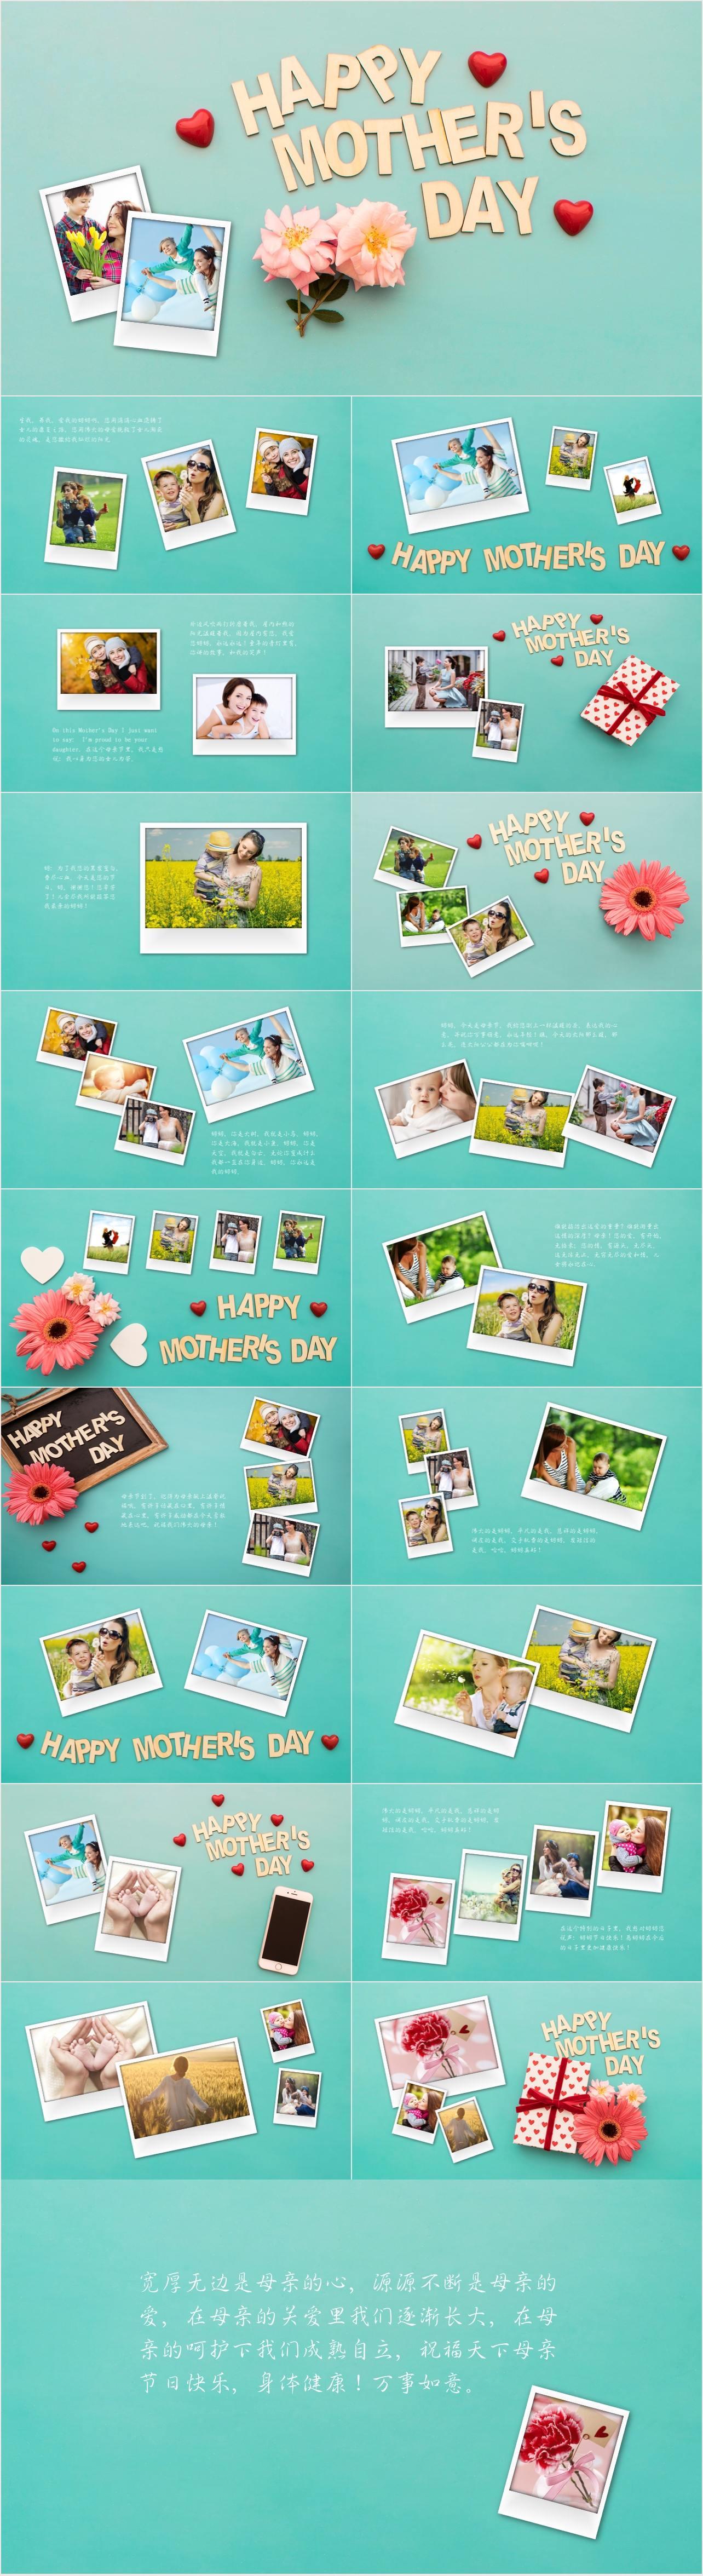 GL00145 母亲节感恩母亲电子相册PPT模板